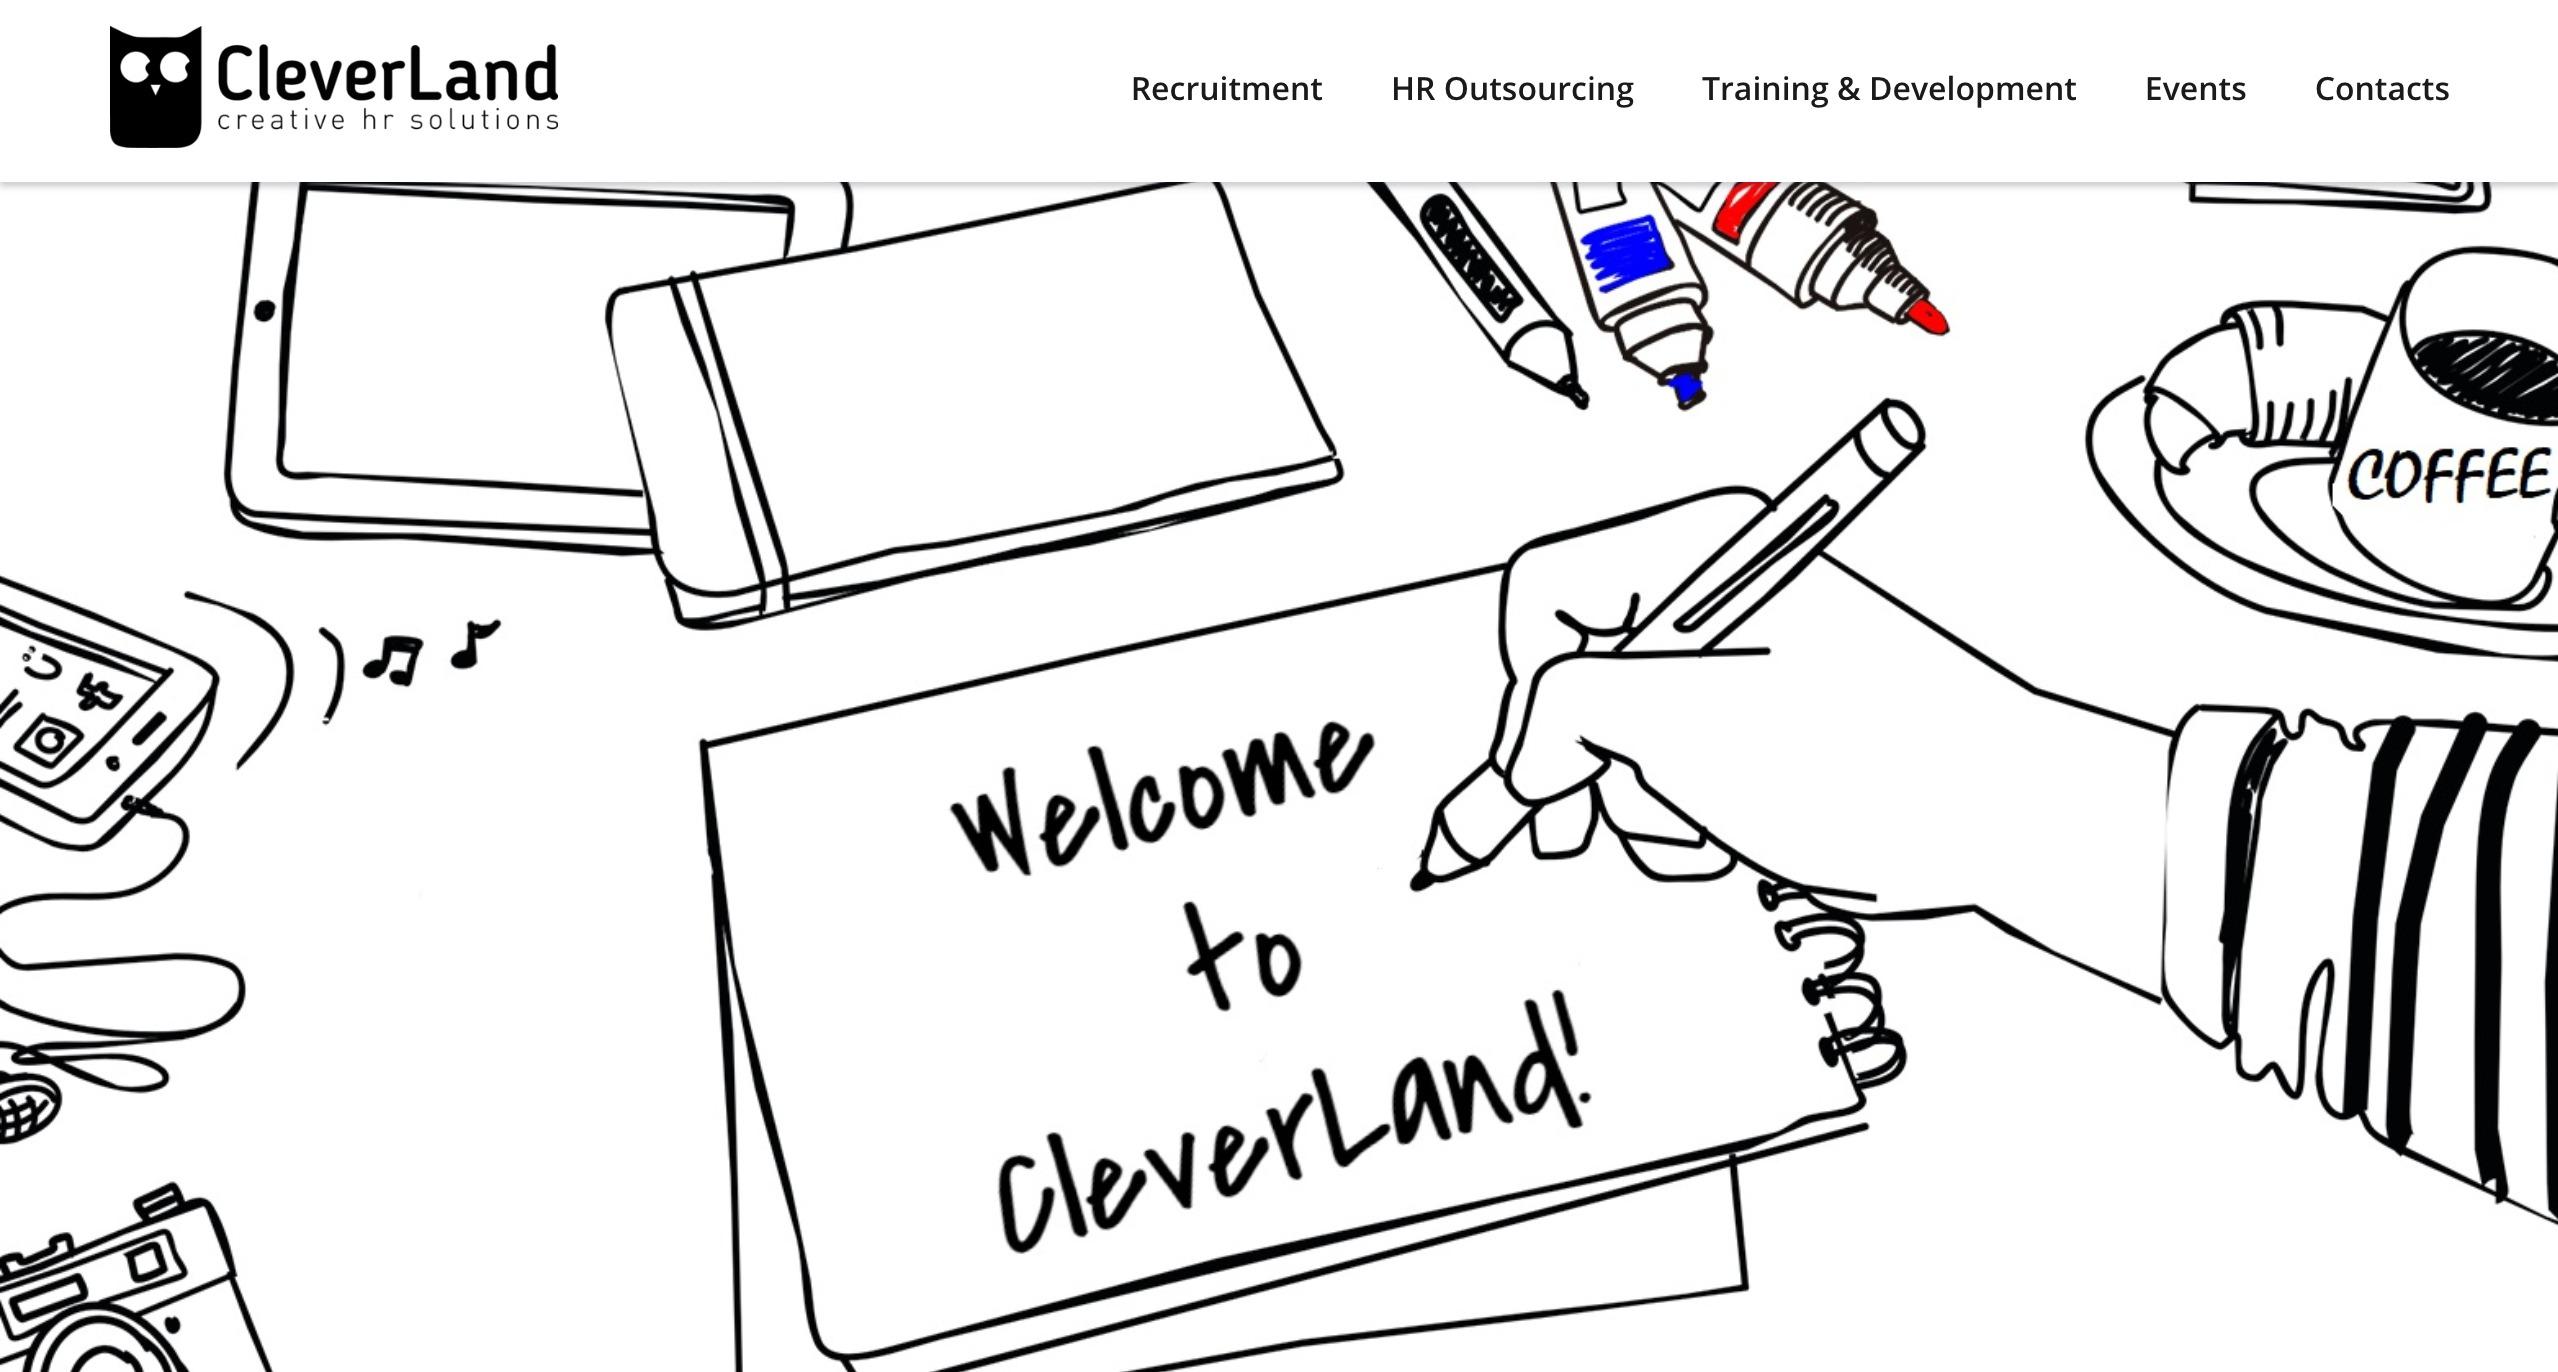 cleverland website